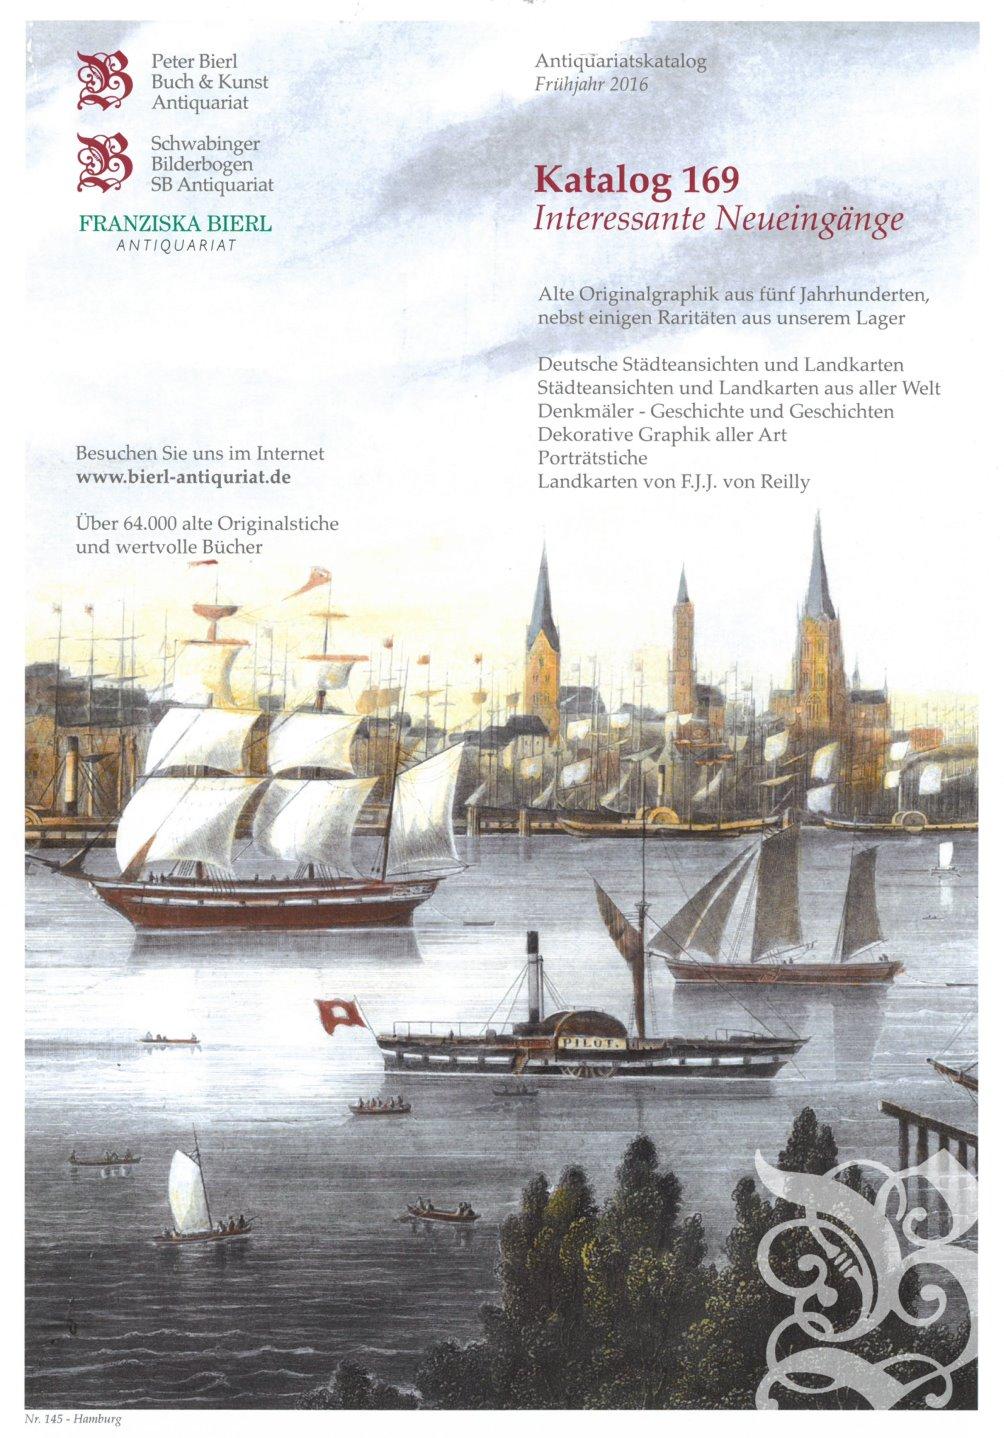 Katalog 169 - Interessante Neueingänge